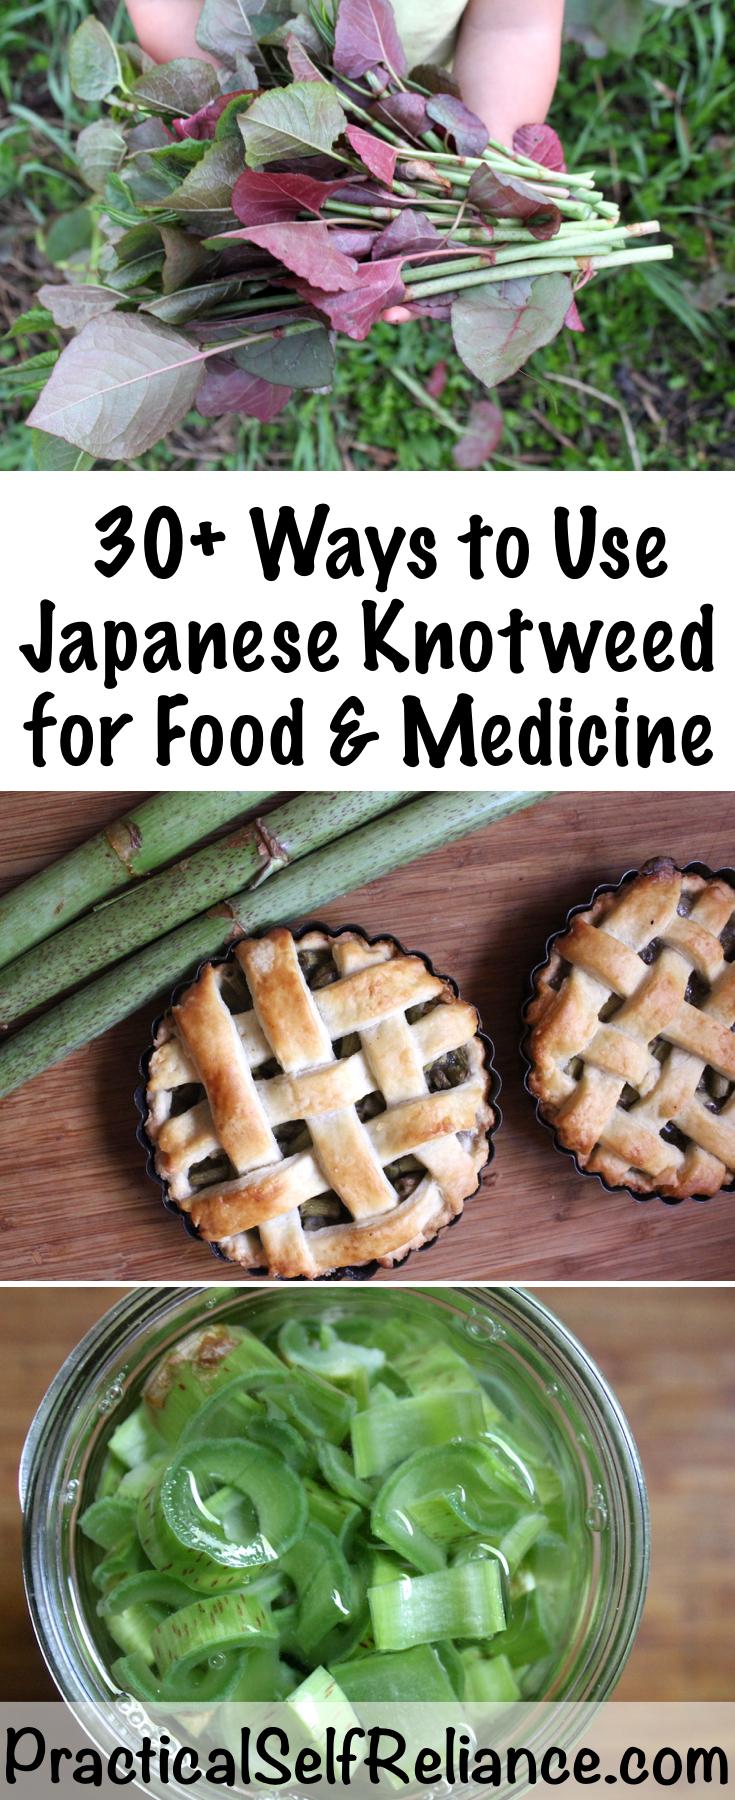 Using Japanese Knotweed for Food and Medicine  #knotweed #foraging #wildfood #gardening #ediblewildfood #spring #springgreens #forage #selfsufficiency